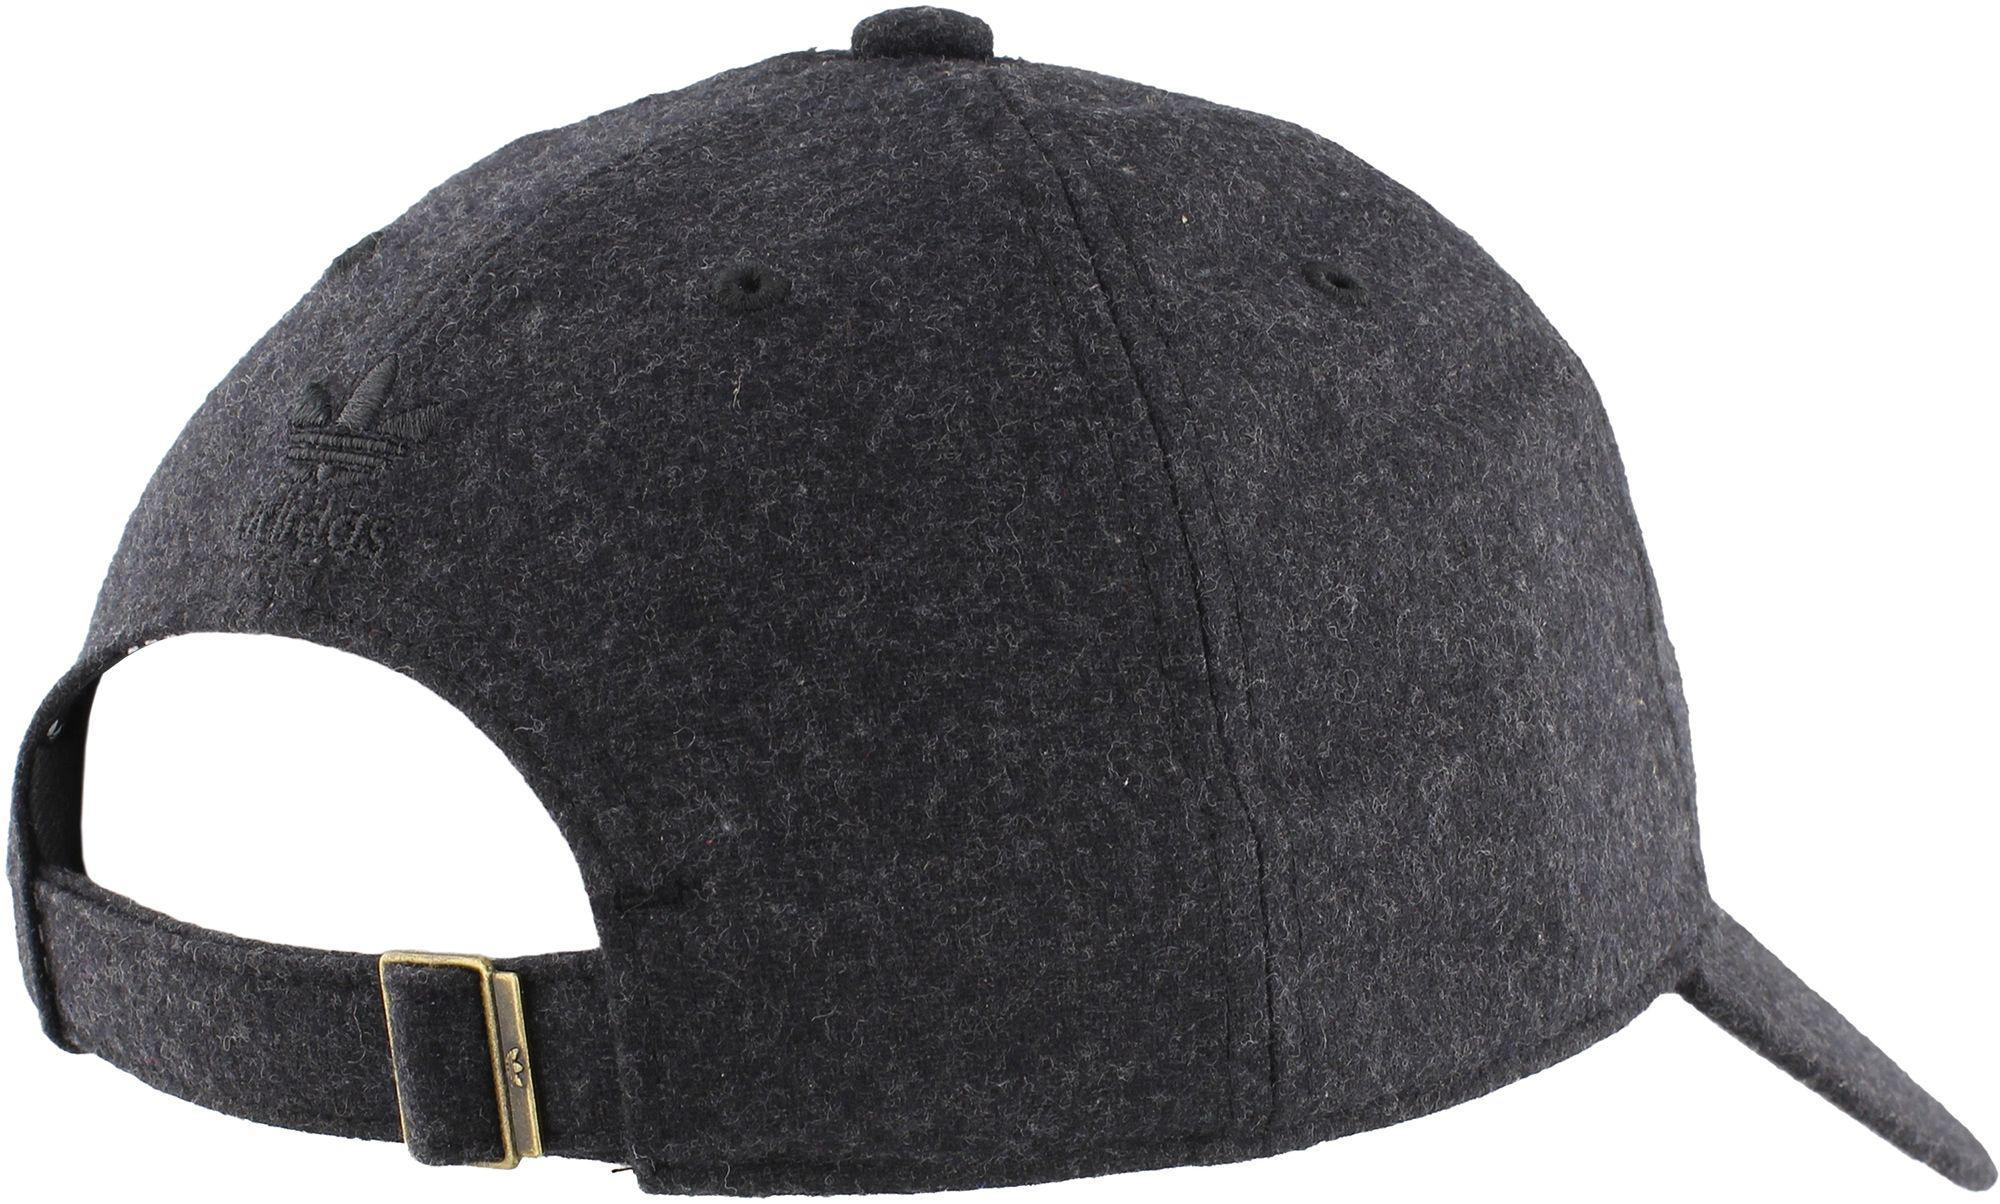 sale retailer 55aa8 eba3f ... Adidas Originals Black Originals Relaxed Plus Strapback Hat for Men Lyst.  View Fullscreen ...